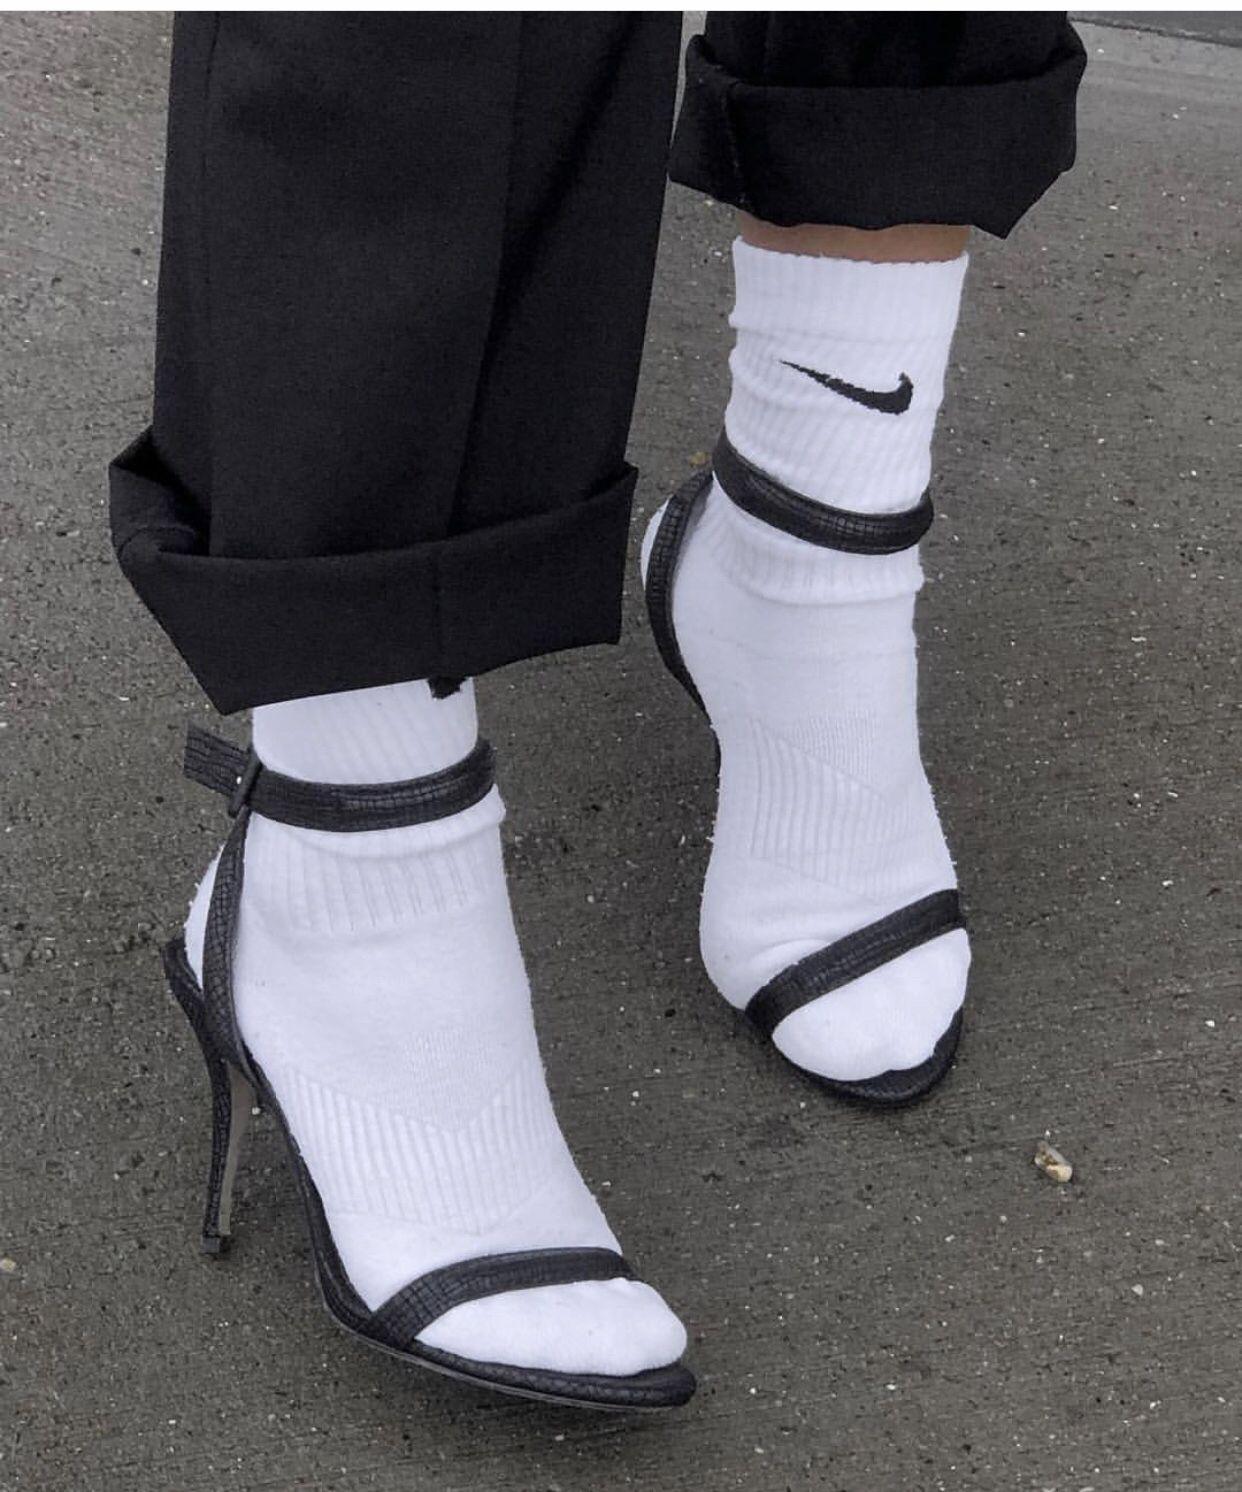 highheels socks white inspo style nike in 2019